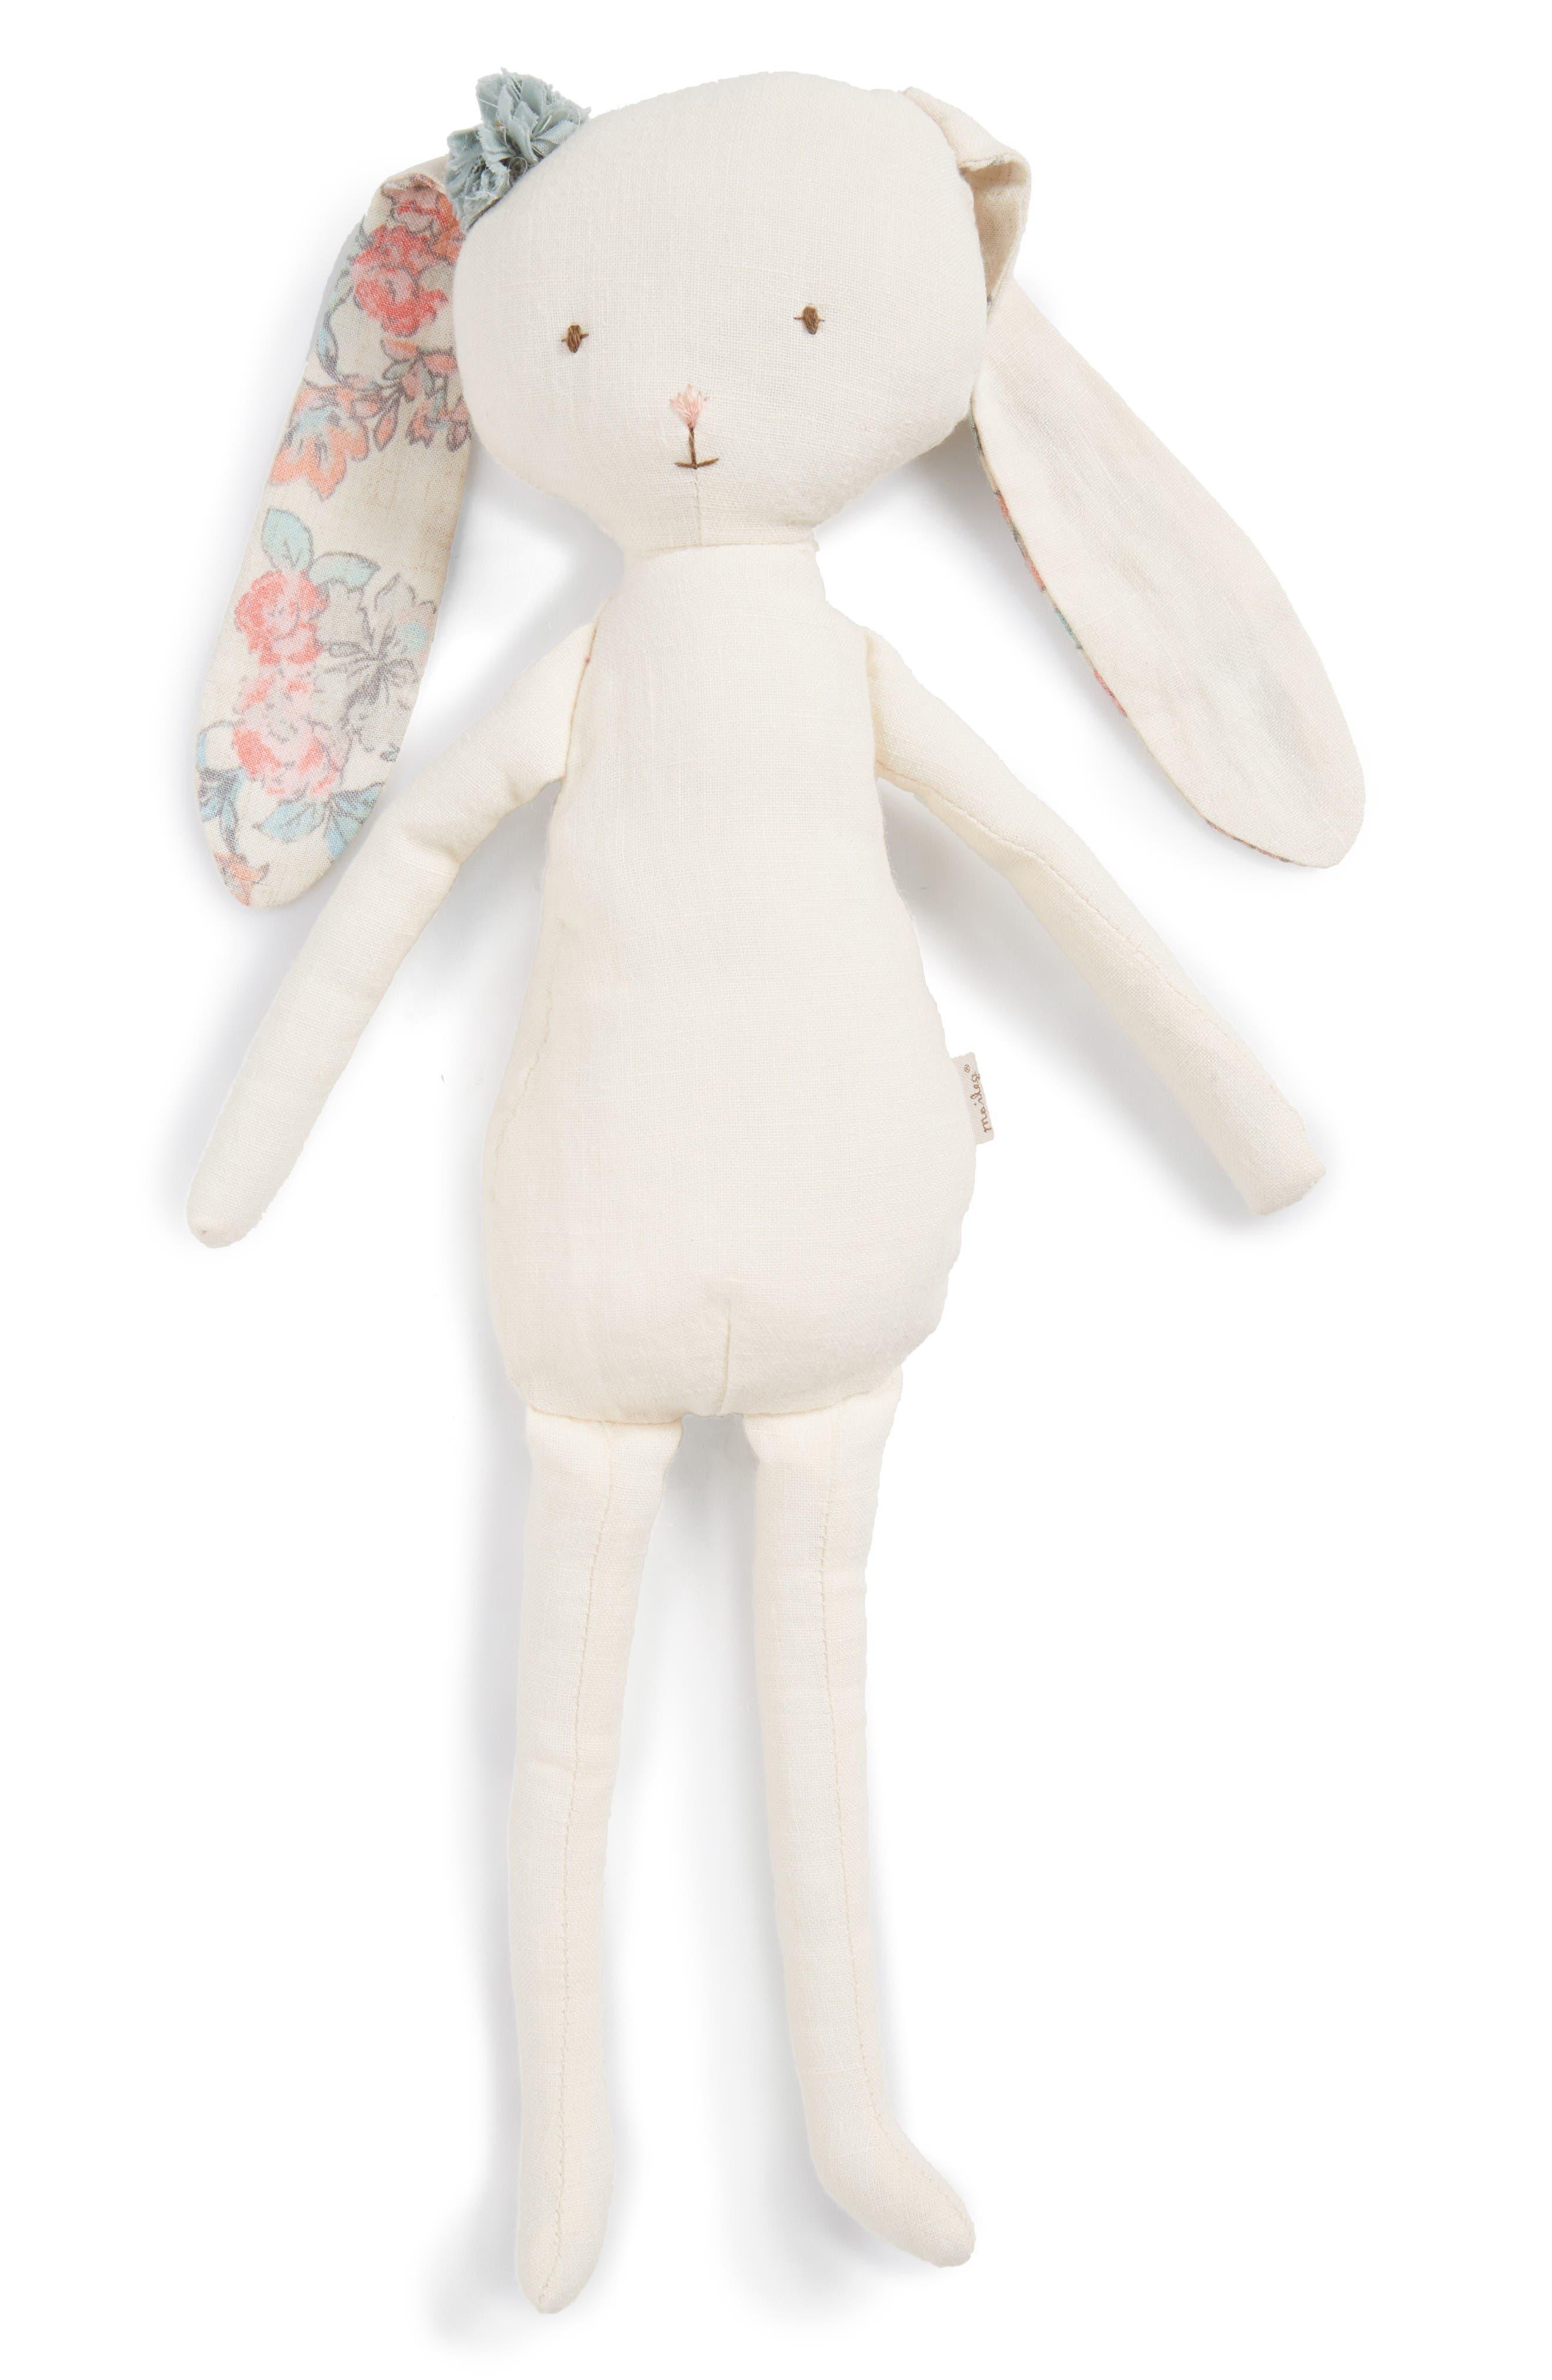 Best Friends Bunny Stuffed Animal,                             Main thumbnail 1, color,                             Multi